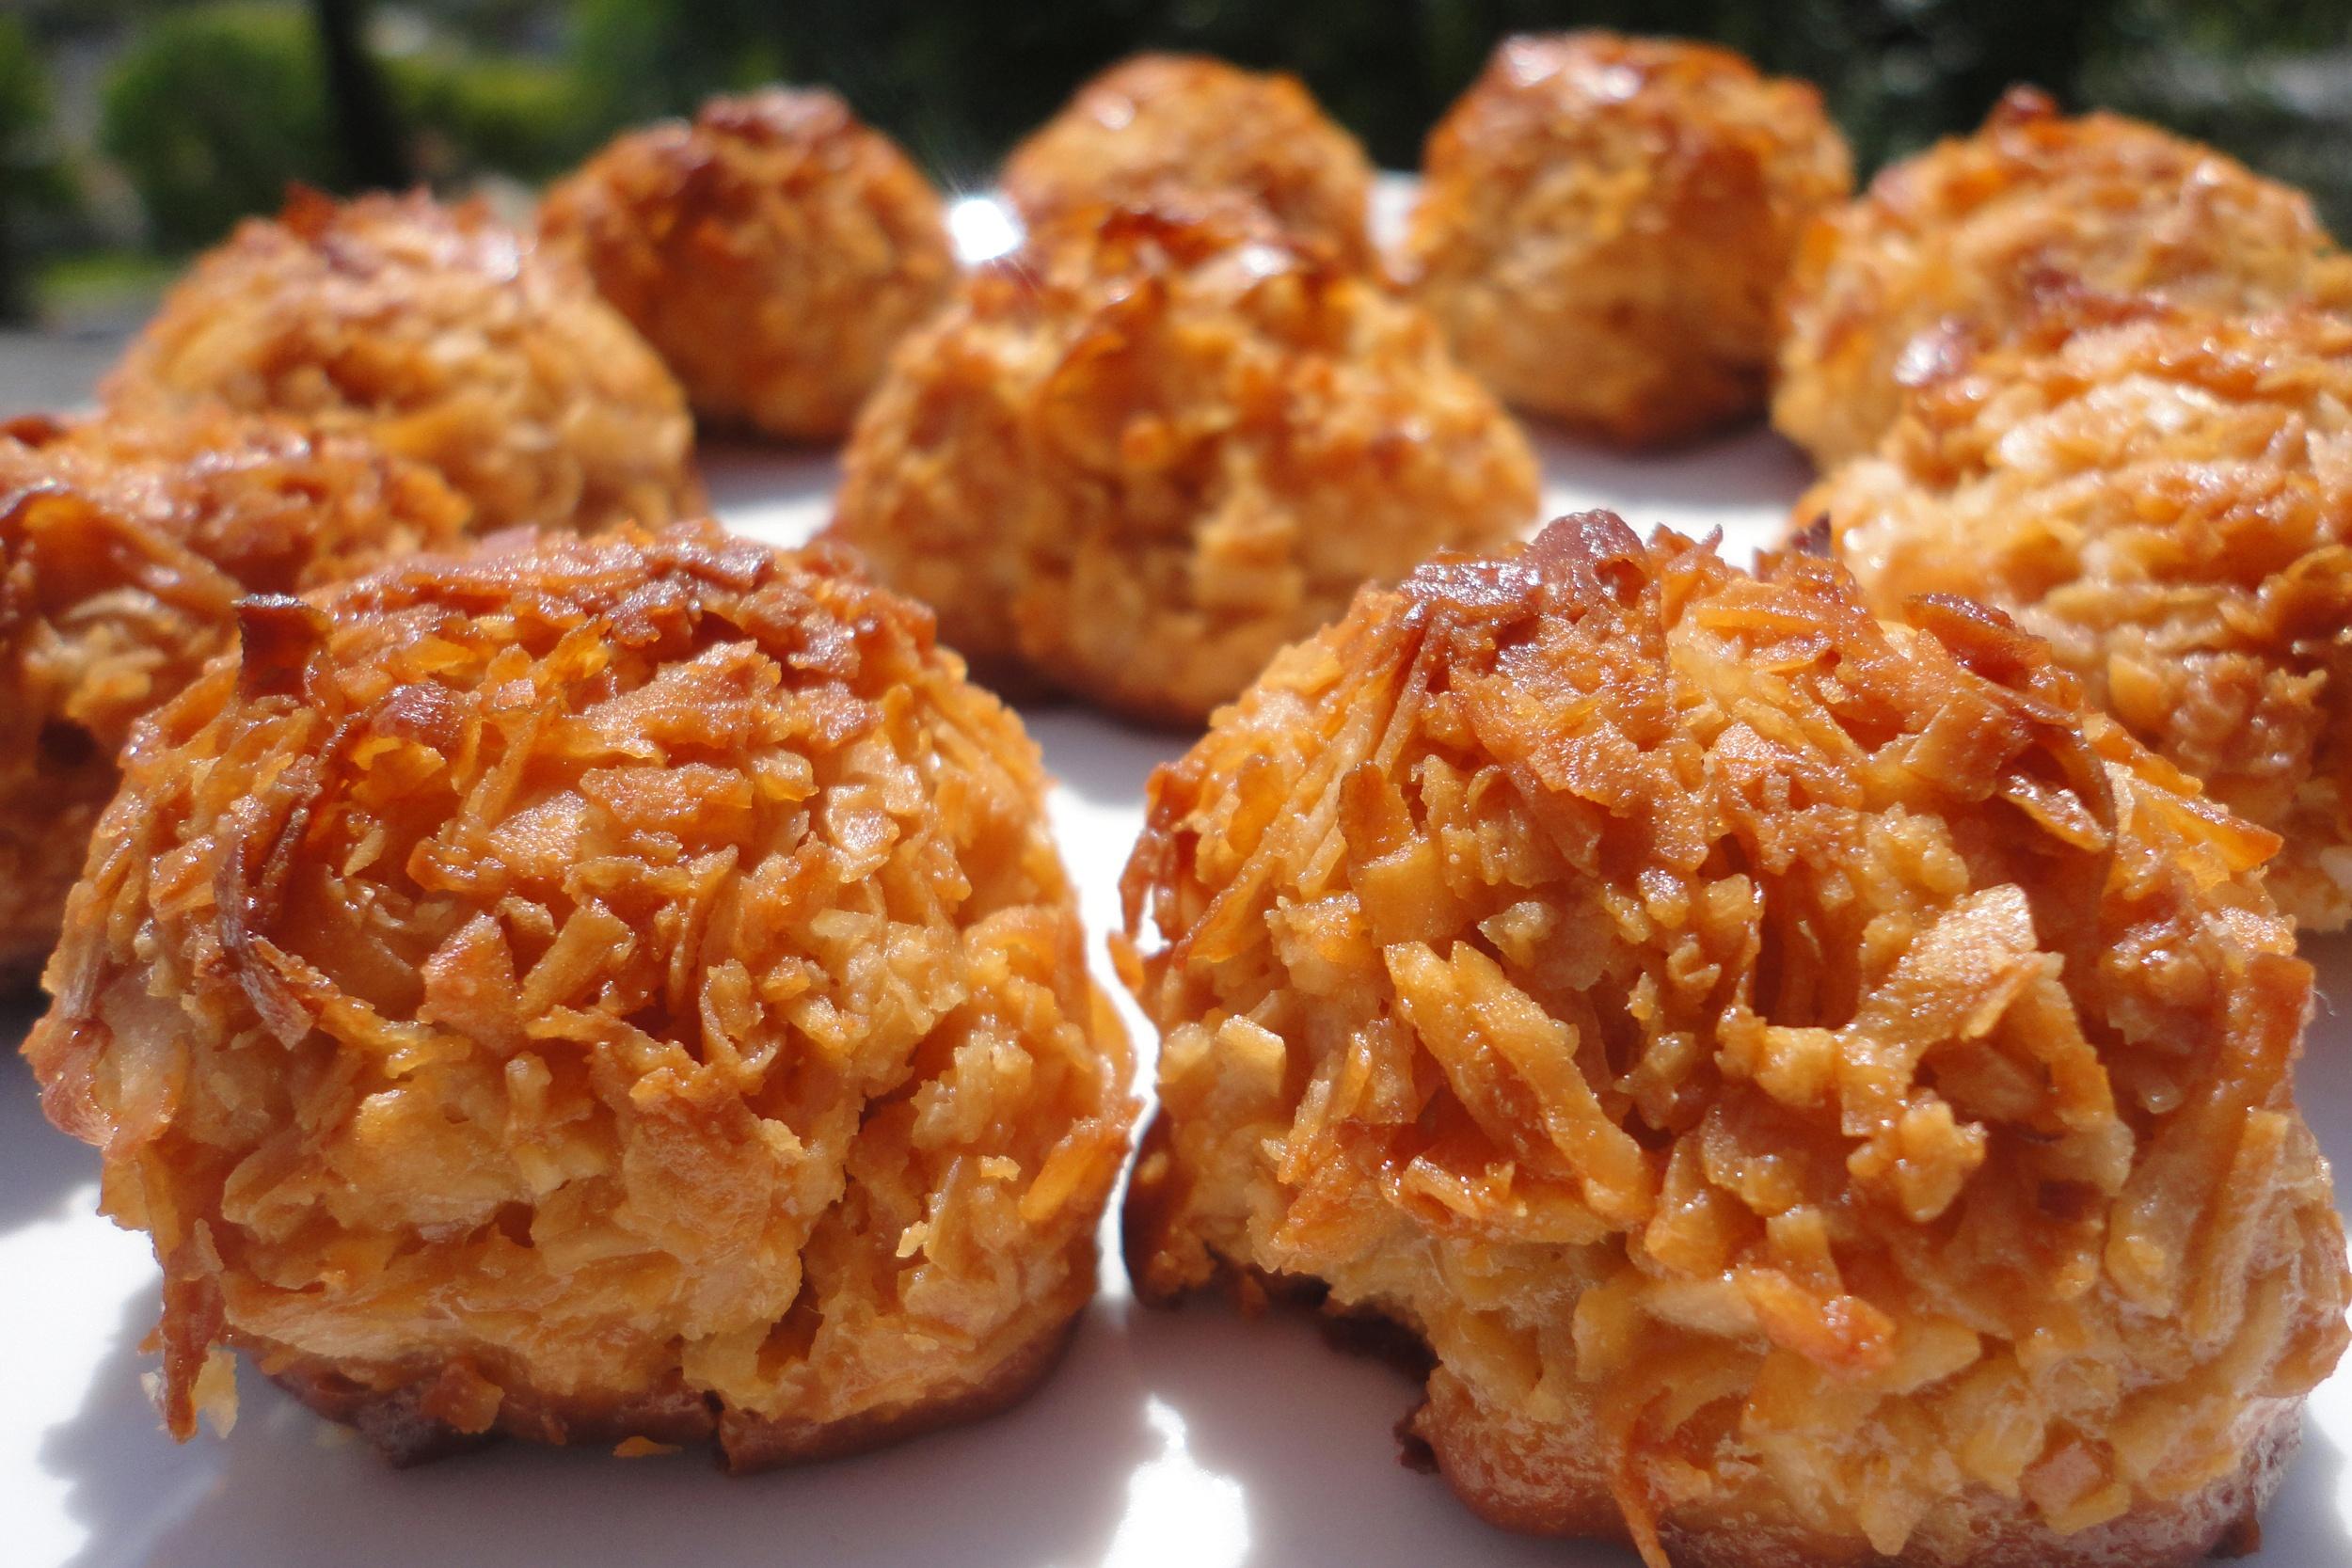 dulces-navidad-proteina-whey-dieta-bioclinica-marbella